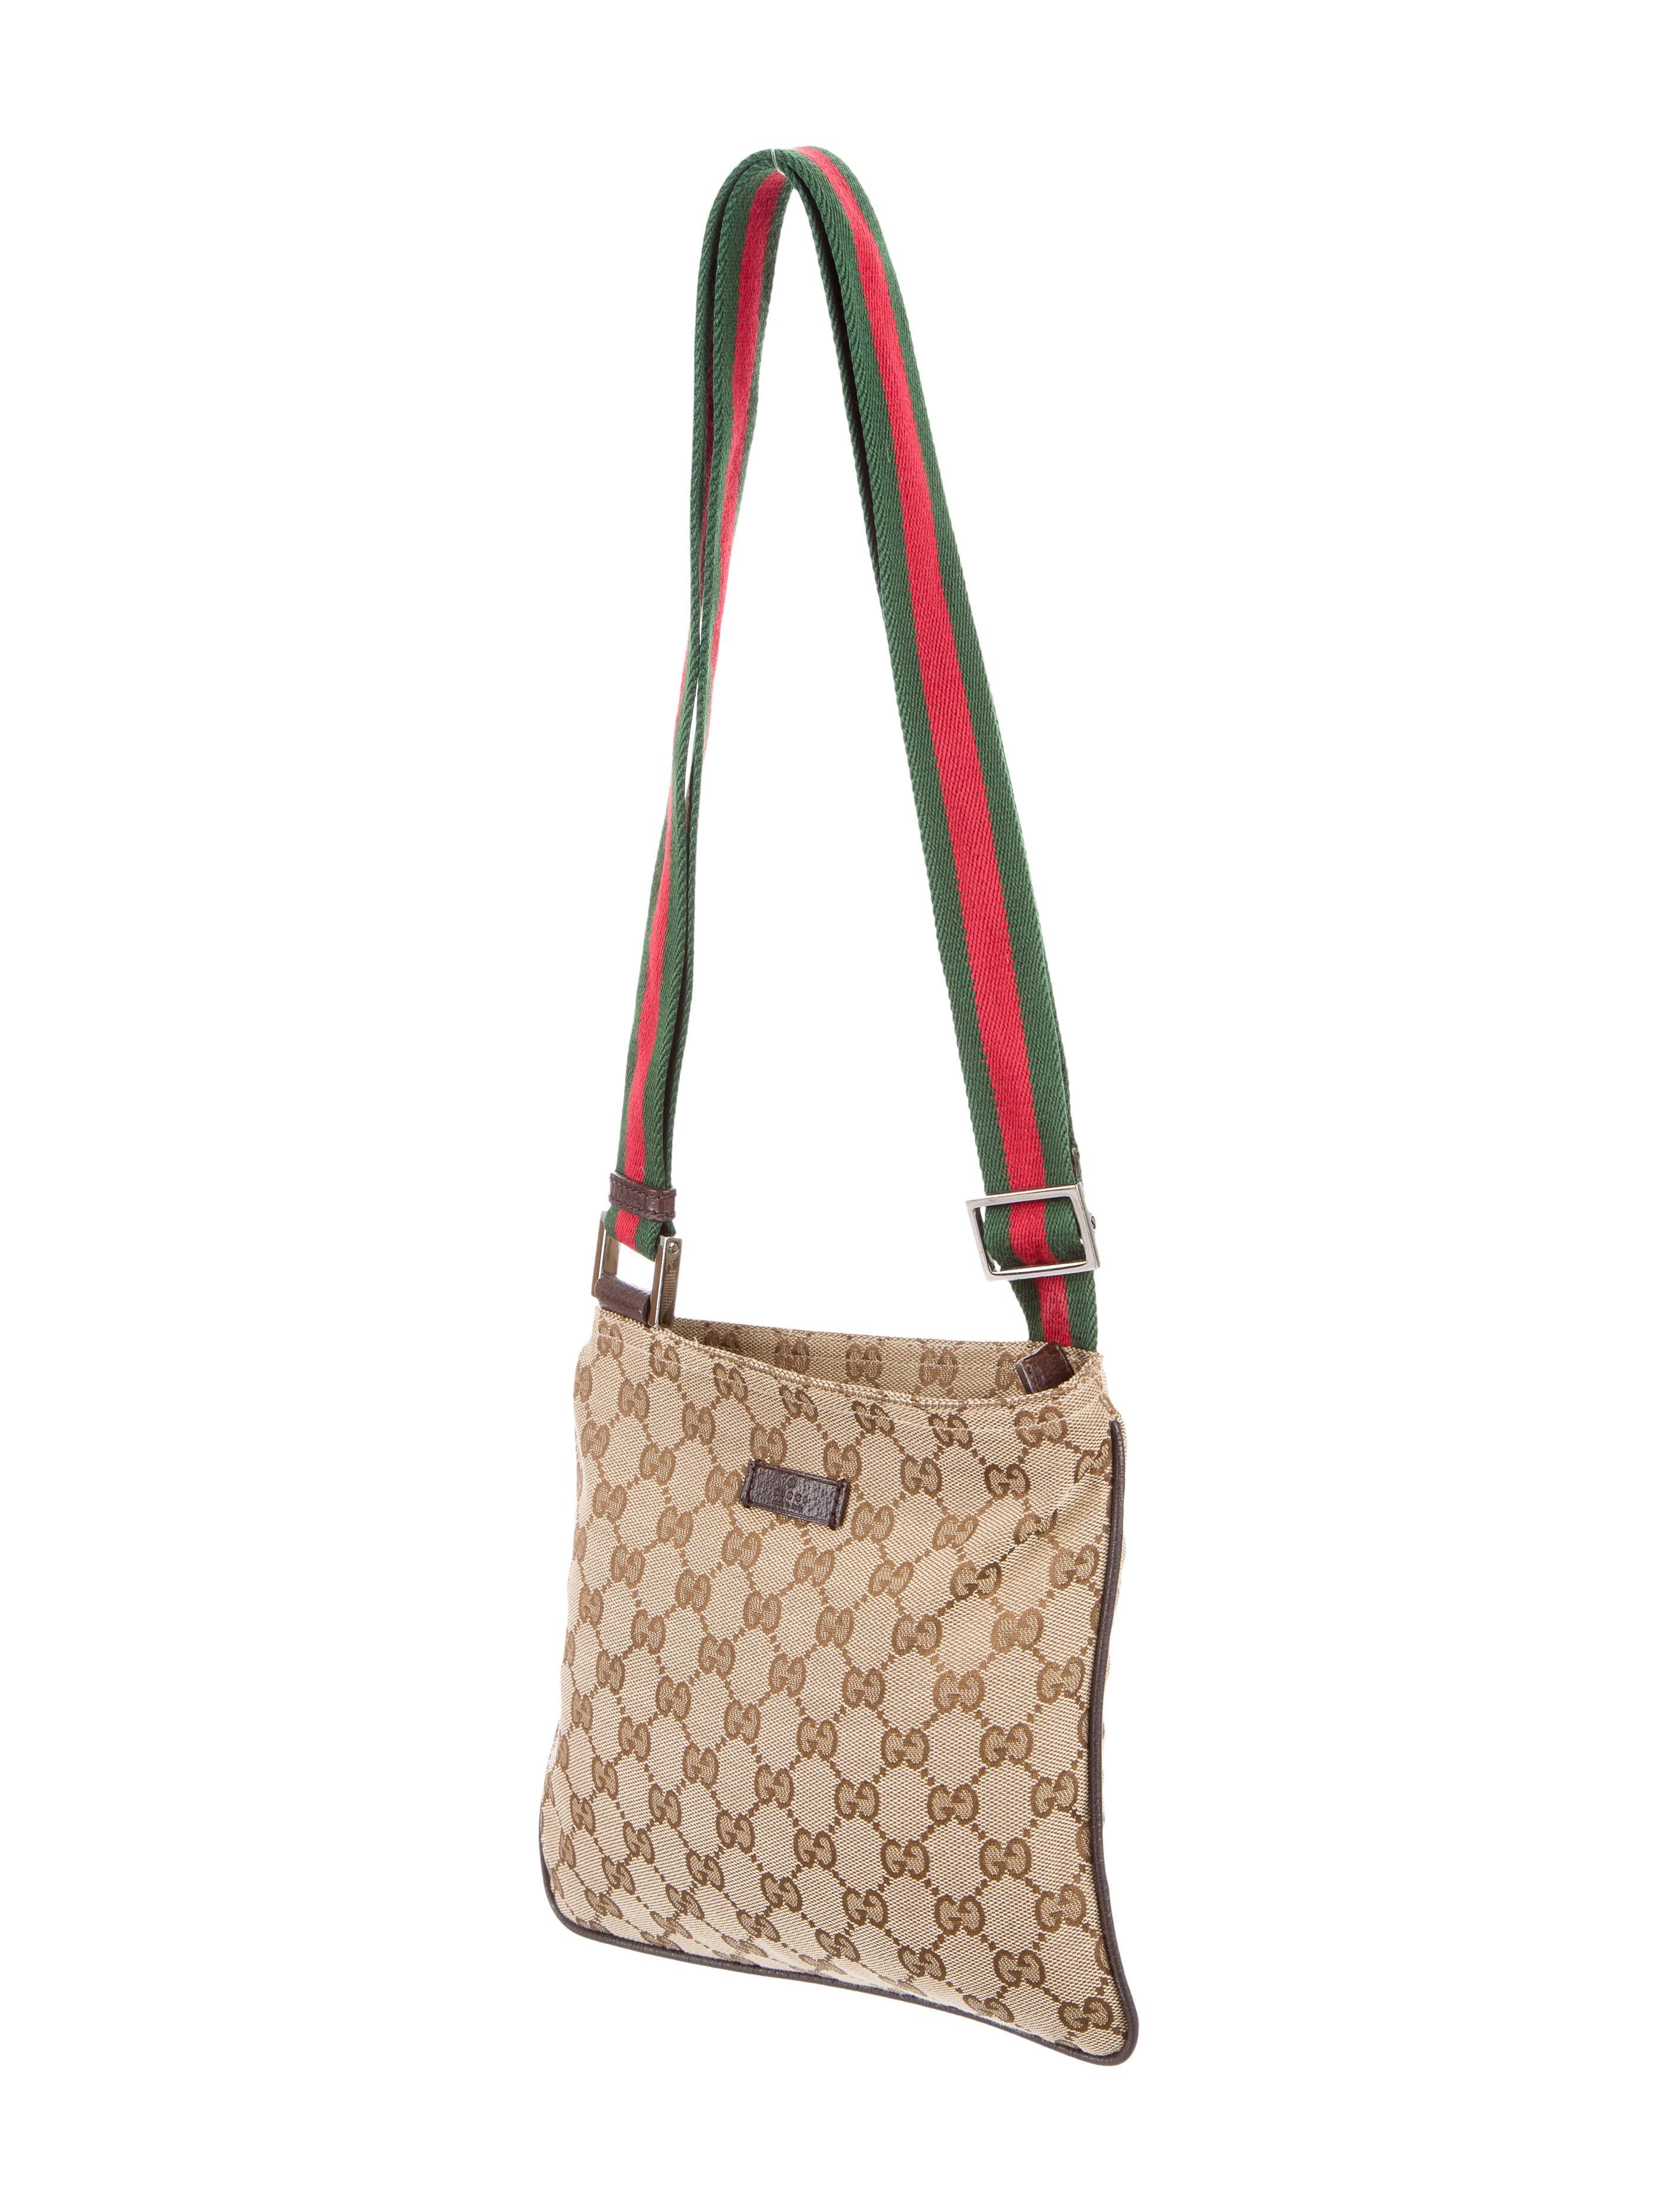 Gucci Gg Canvas Messenger Bag Handbags Guc135900 The